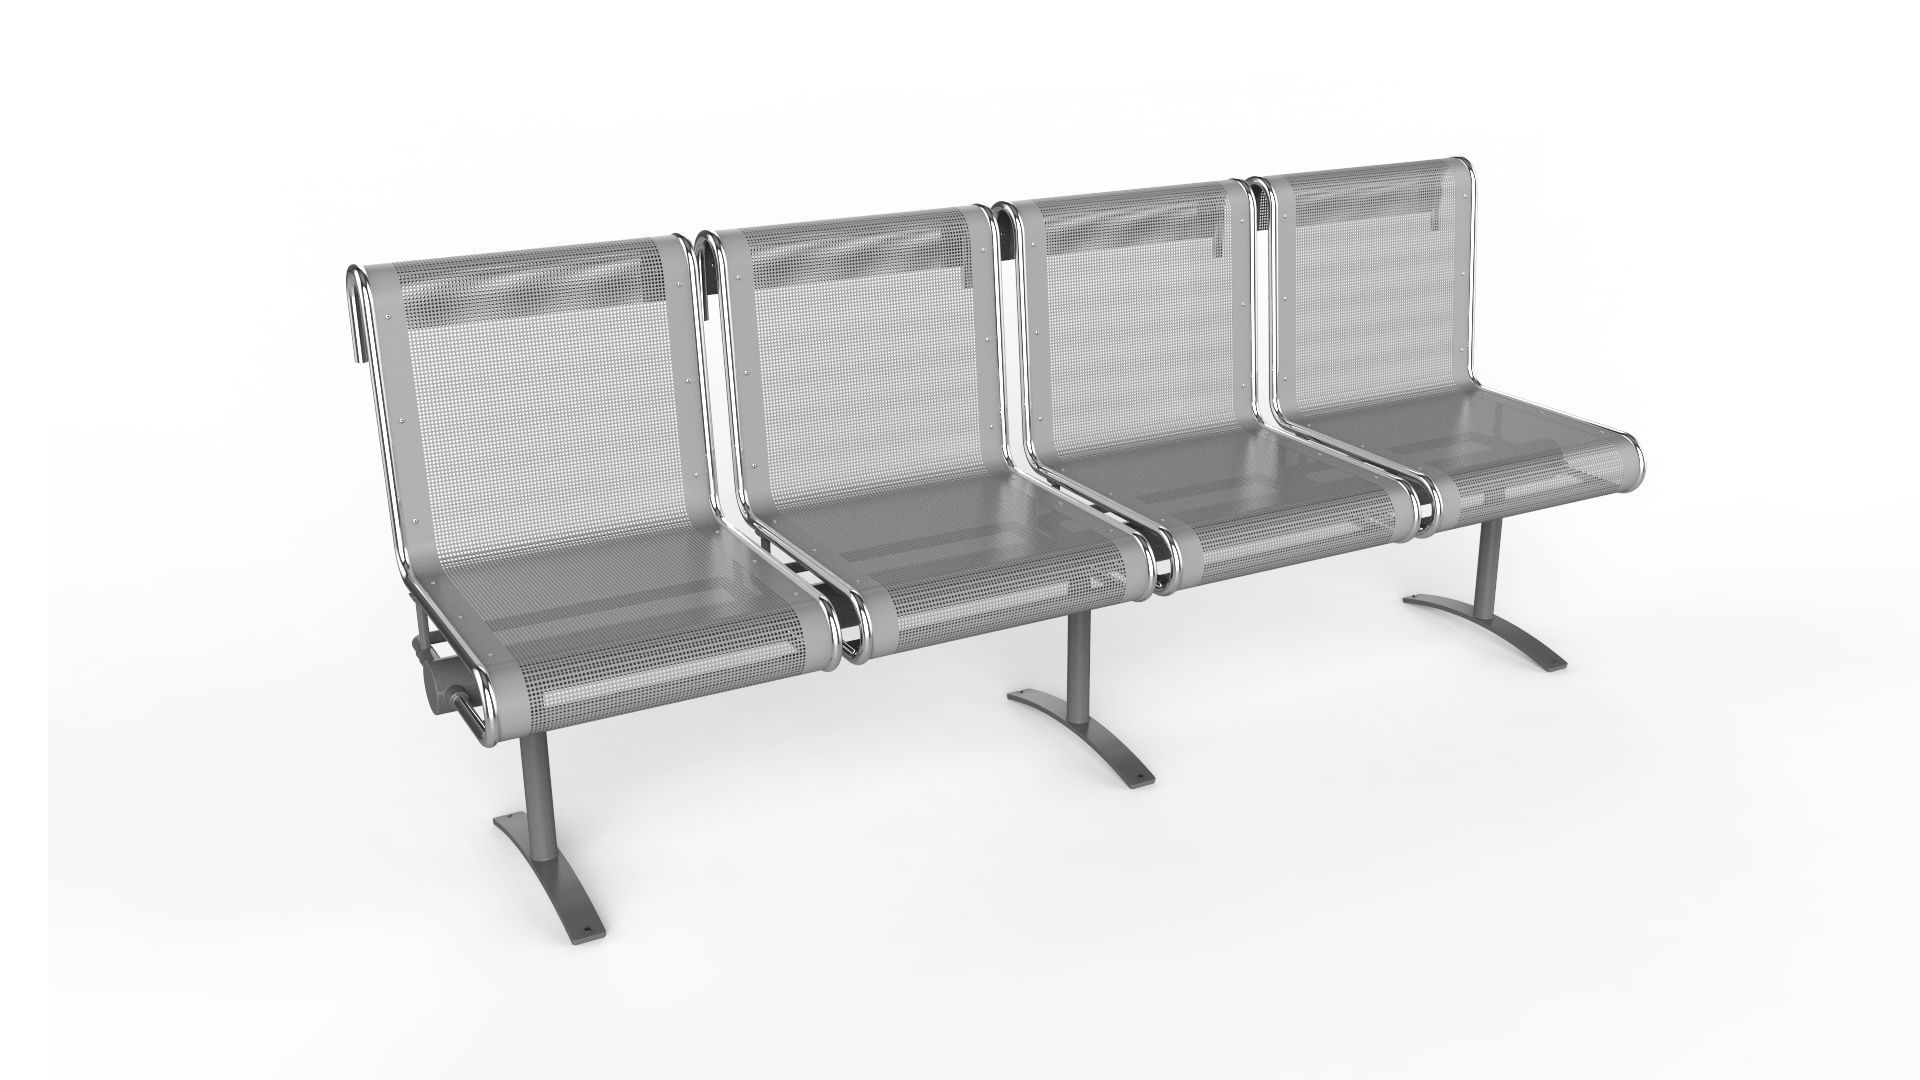 Waiting Room Chair 4 Seats